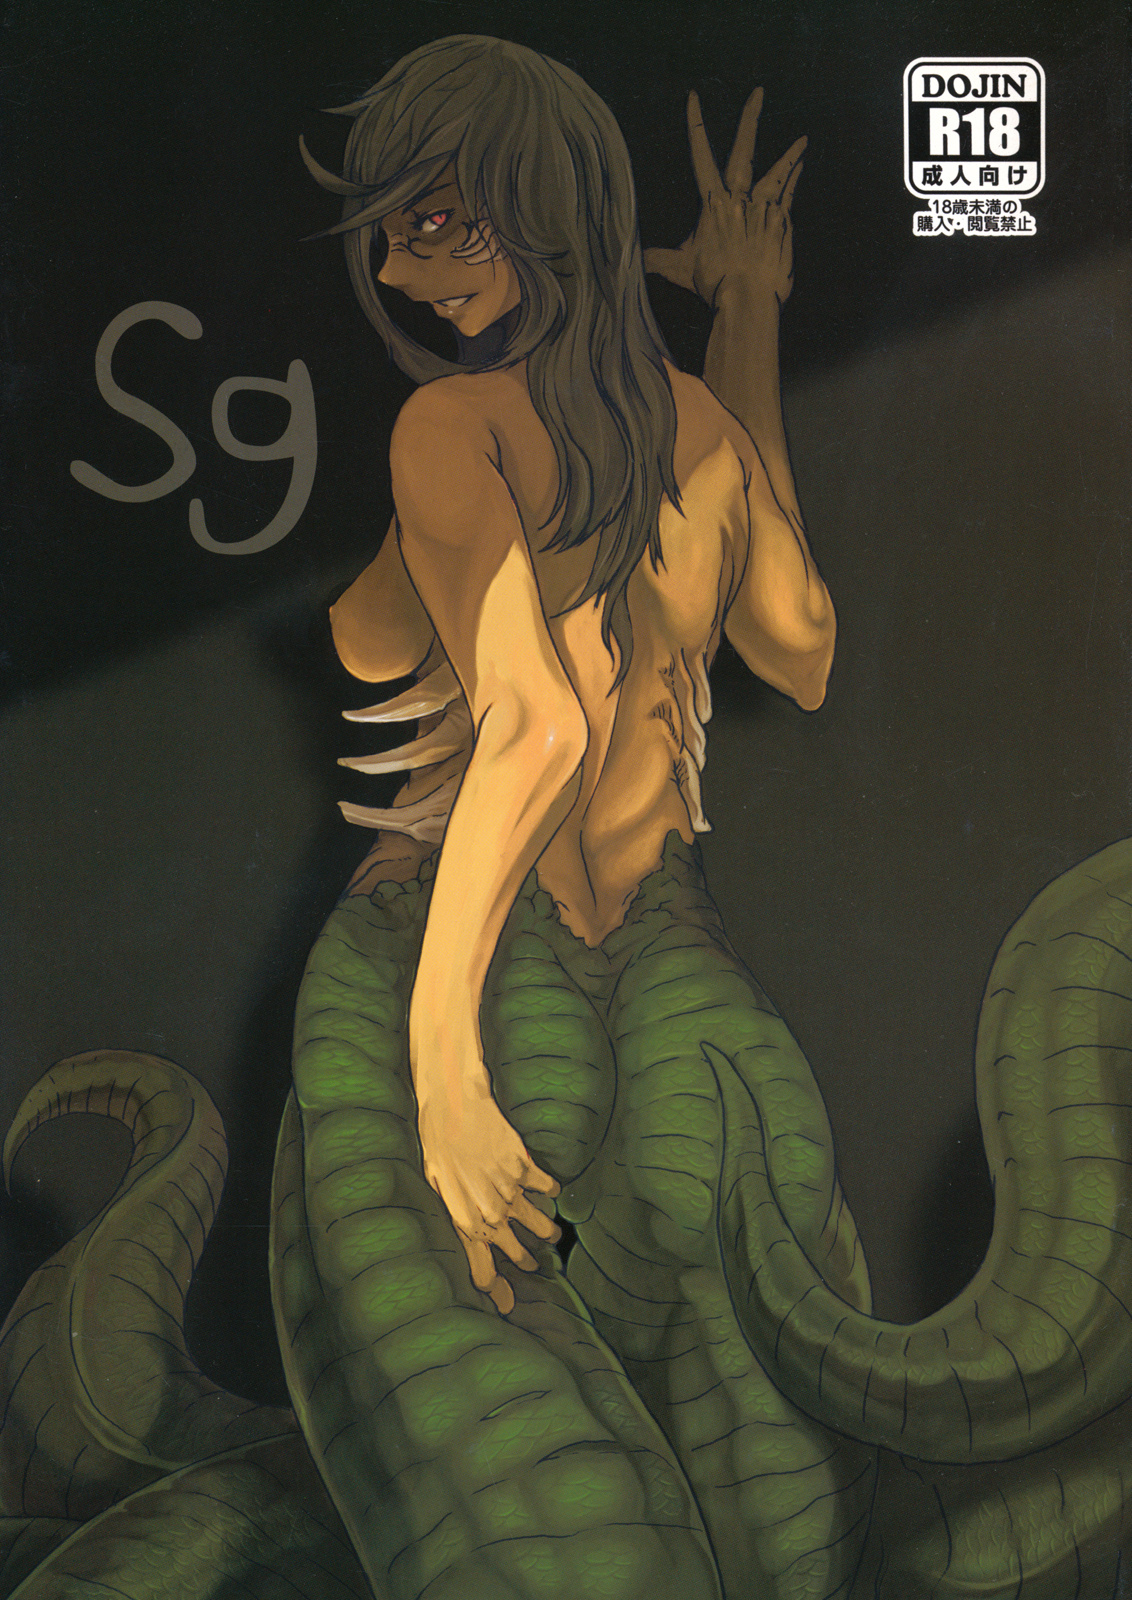 sg_01